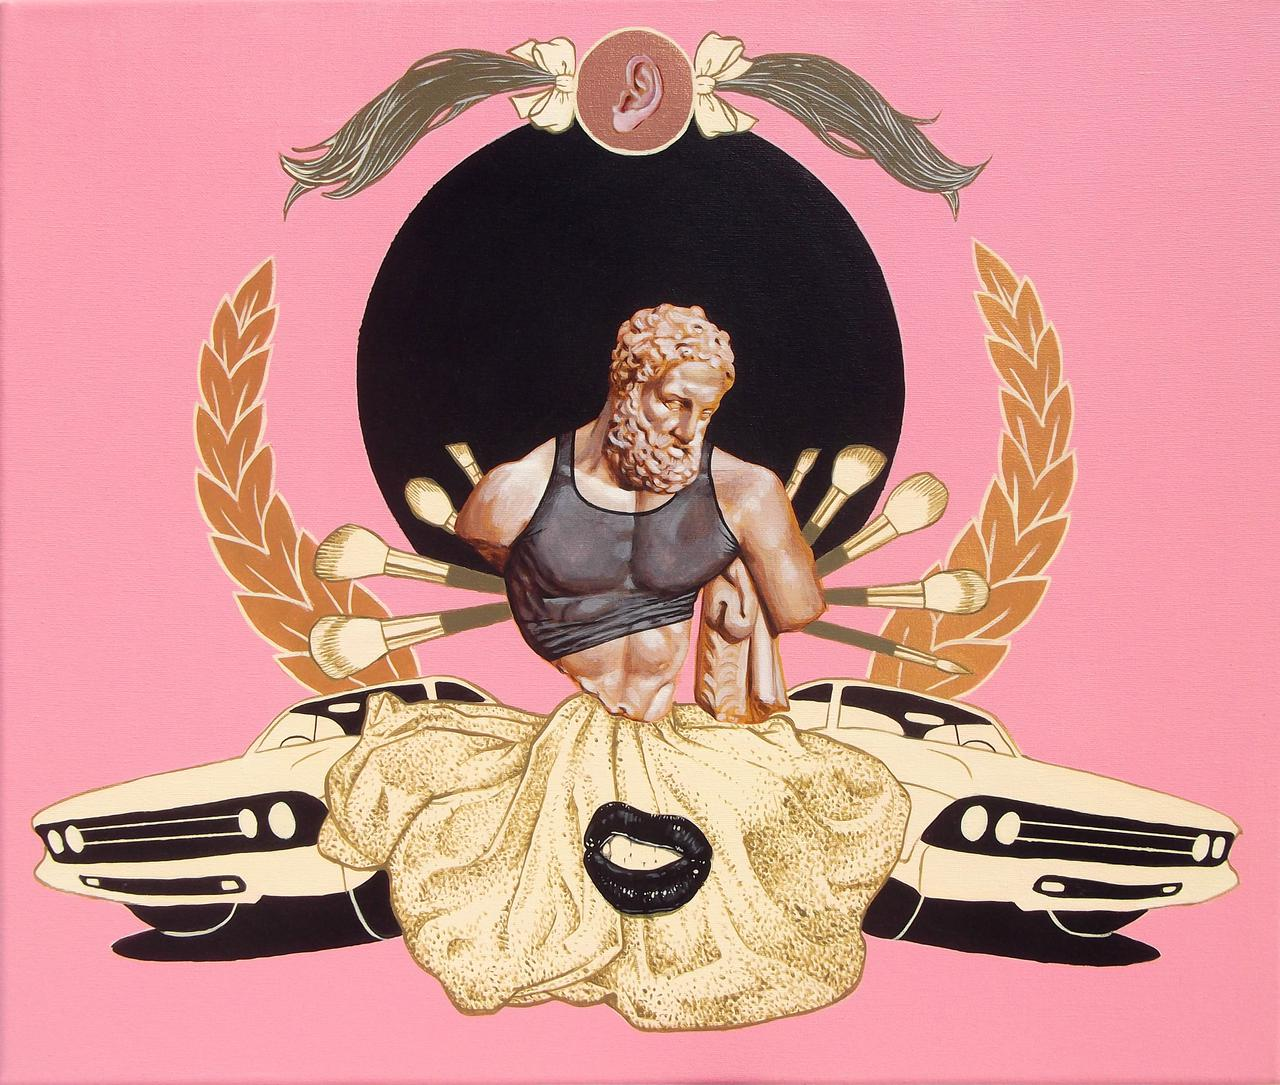 Hercules MMXVII,,acrylic on canvas,60 x 50 cm